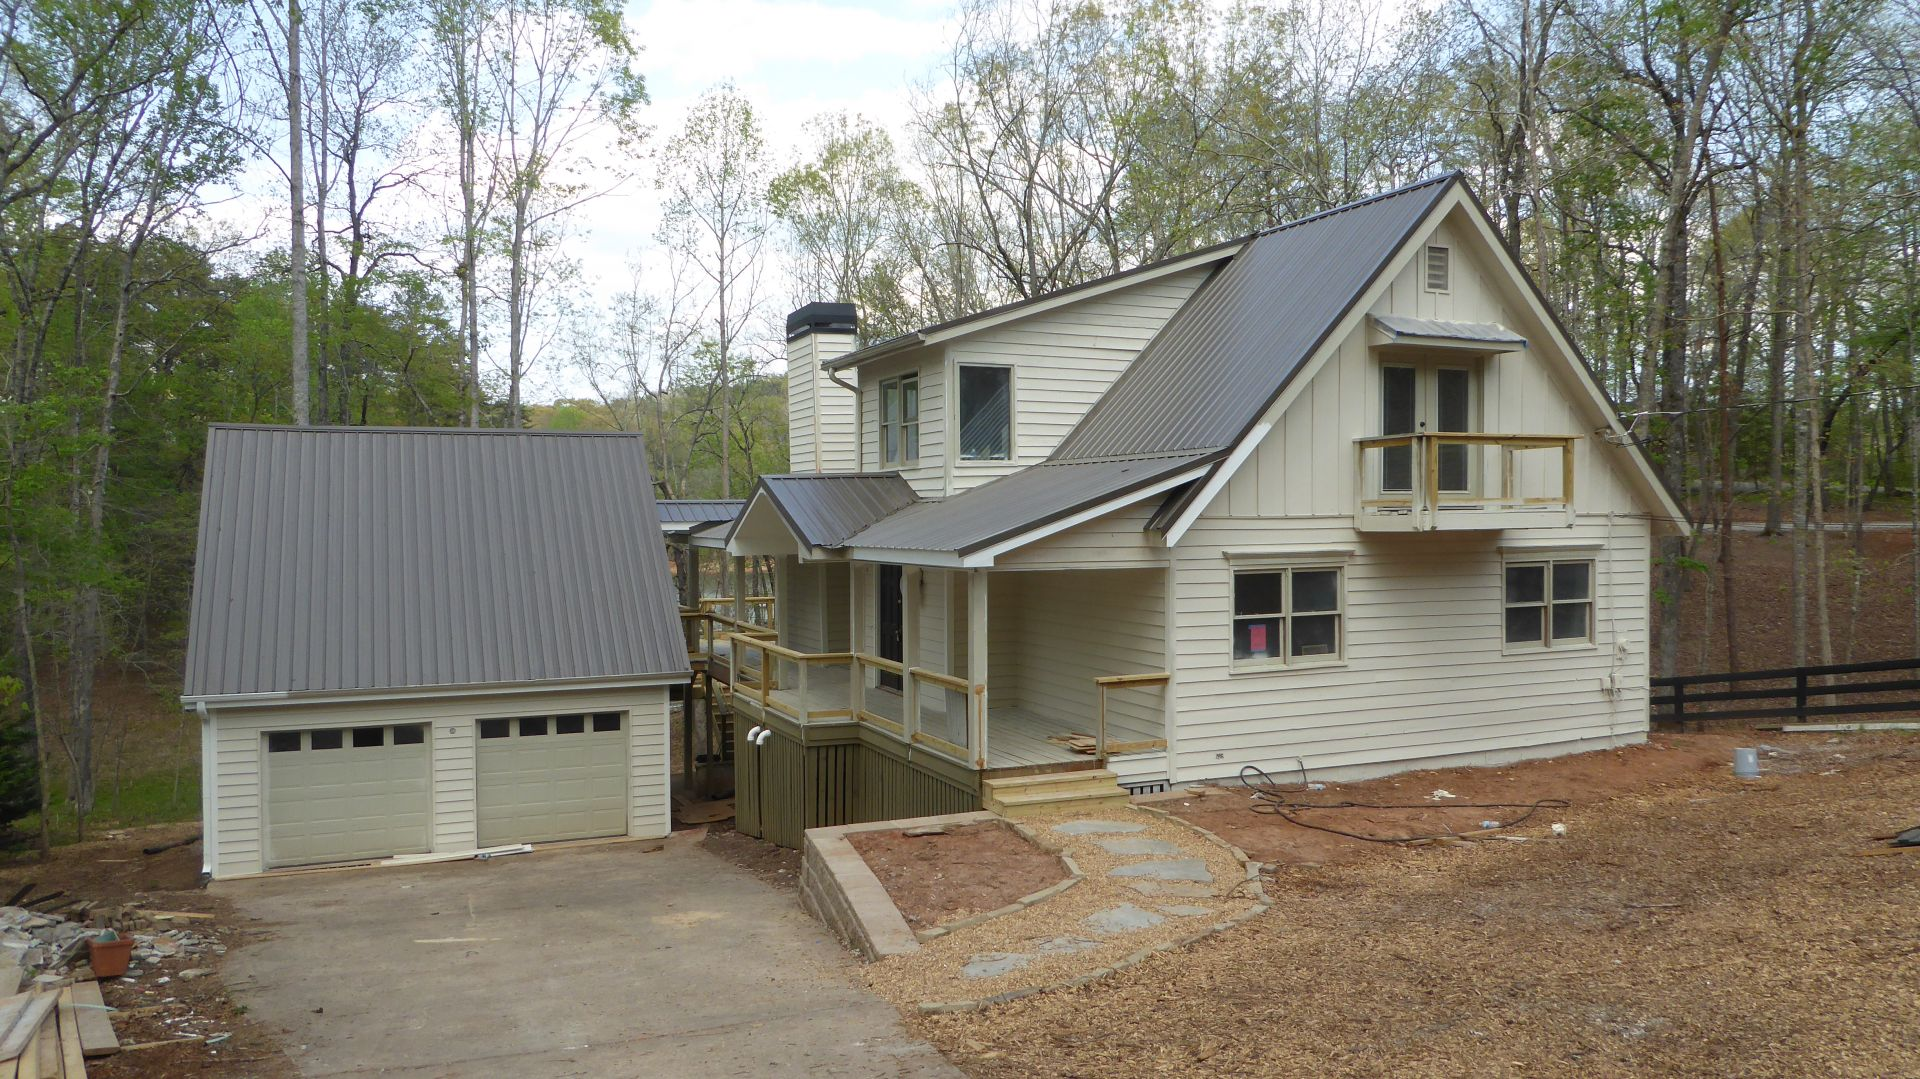 Lake Lanier Home Renovation in Progress